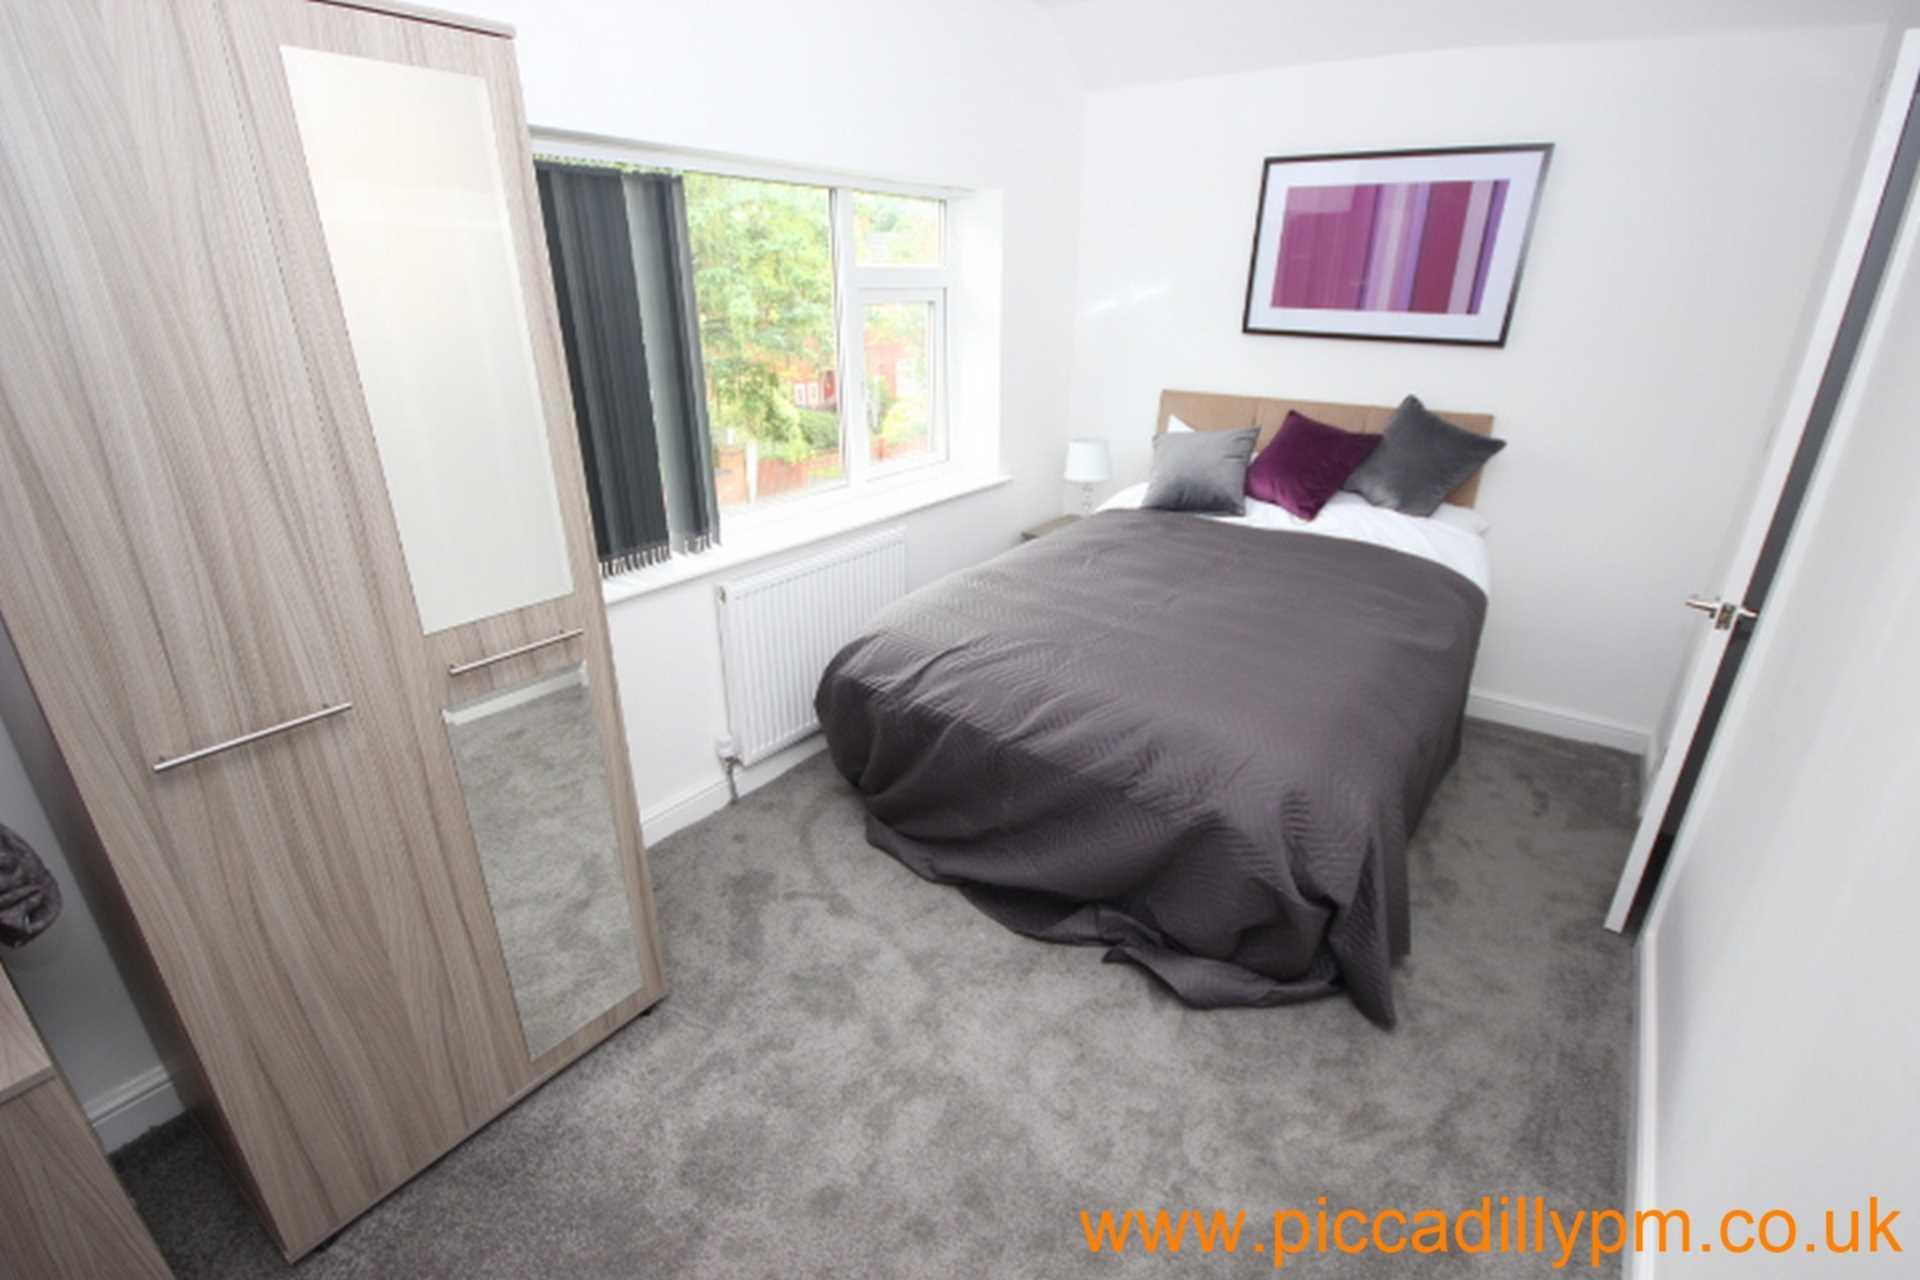 Piccadilly Property Management Ltd - 5 Bedroom Semi-Detached, Normanton Avenue, Salford